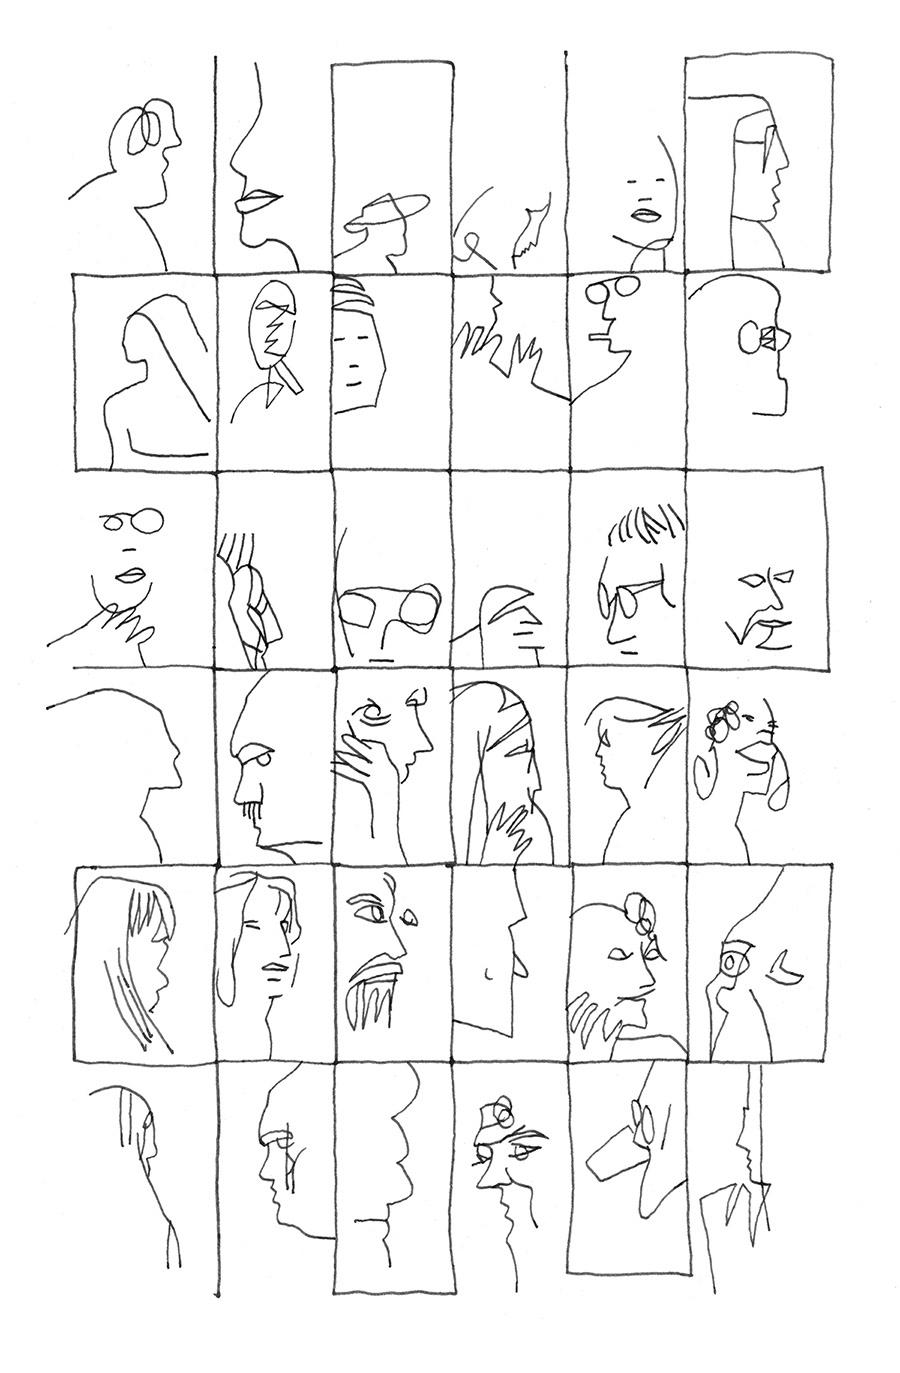 Image may contain: drawing, sketch and cartoon